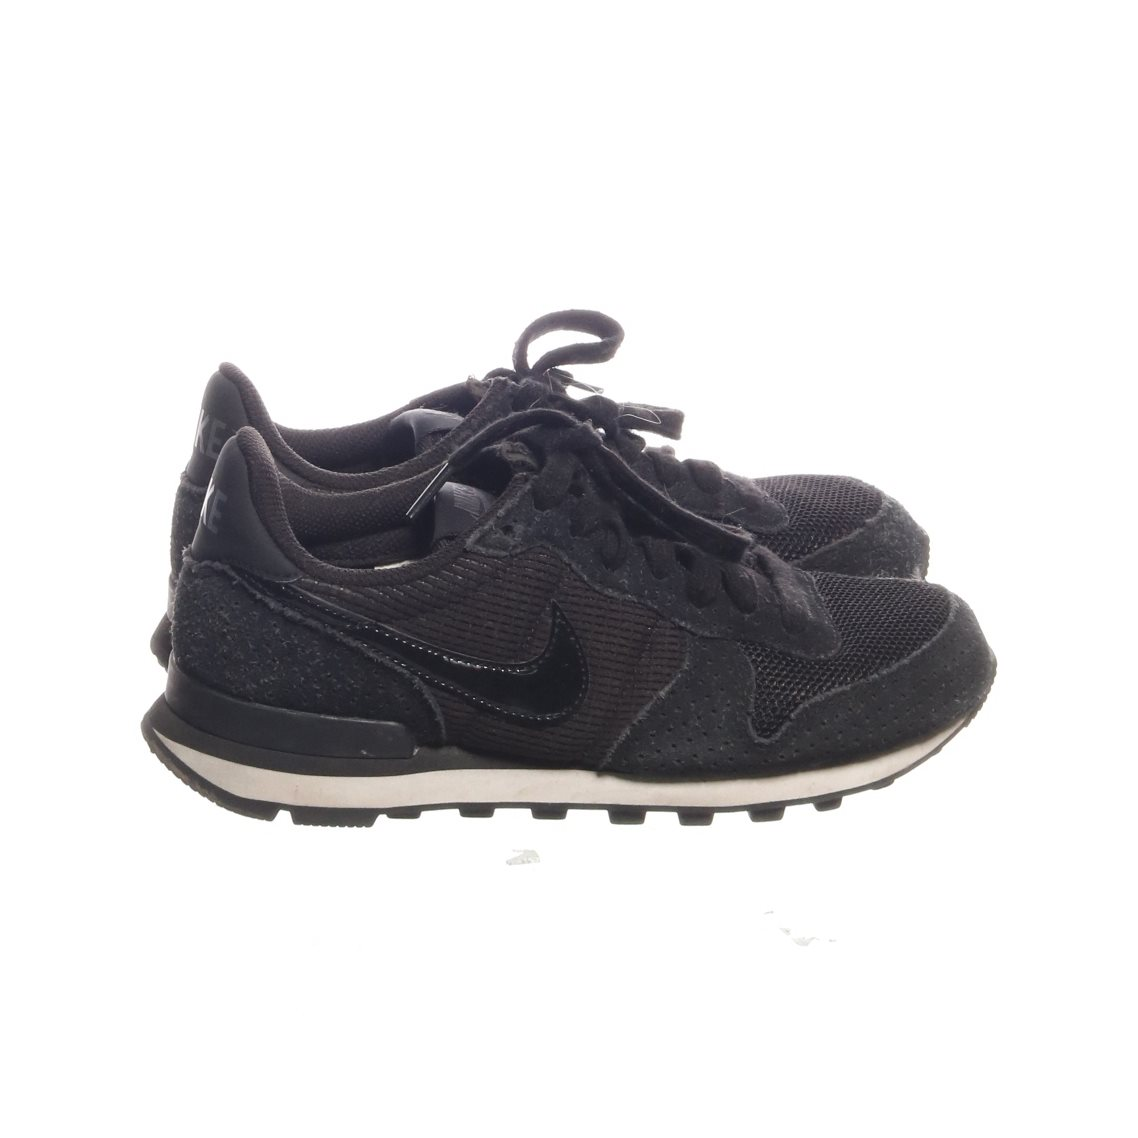 best loved aae8e a9cde Nike, Träningsskor, Strl  36, Svart Vit